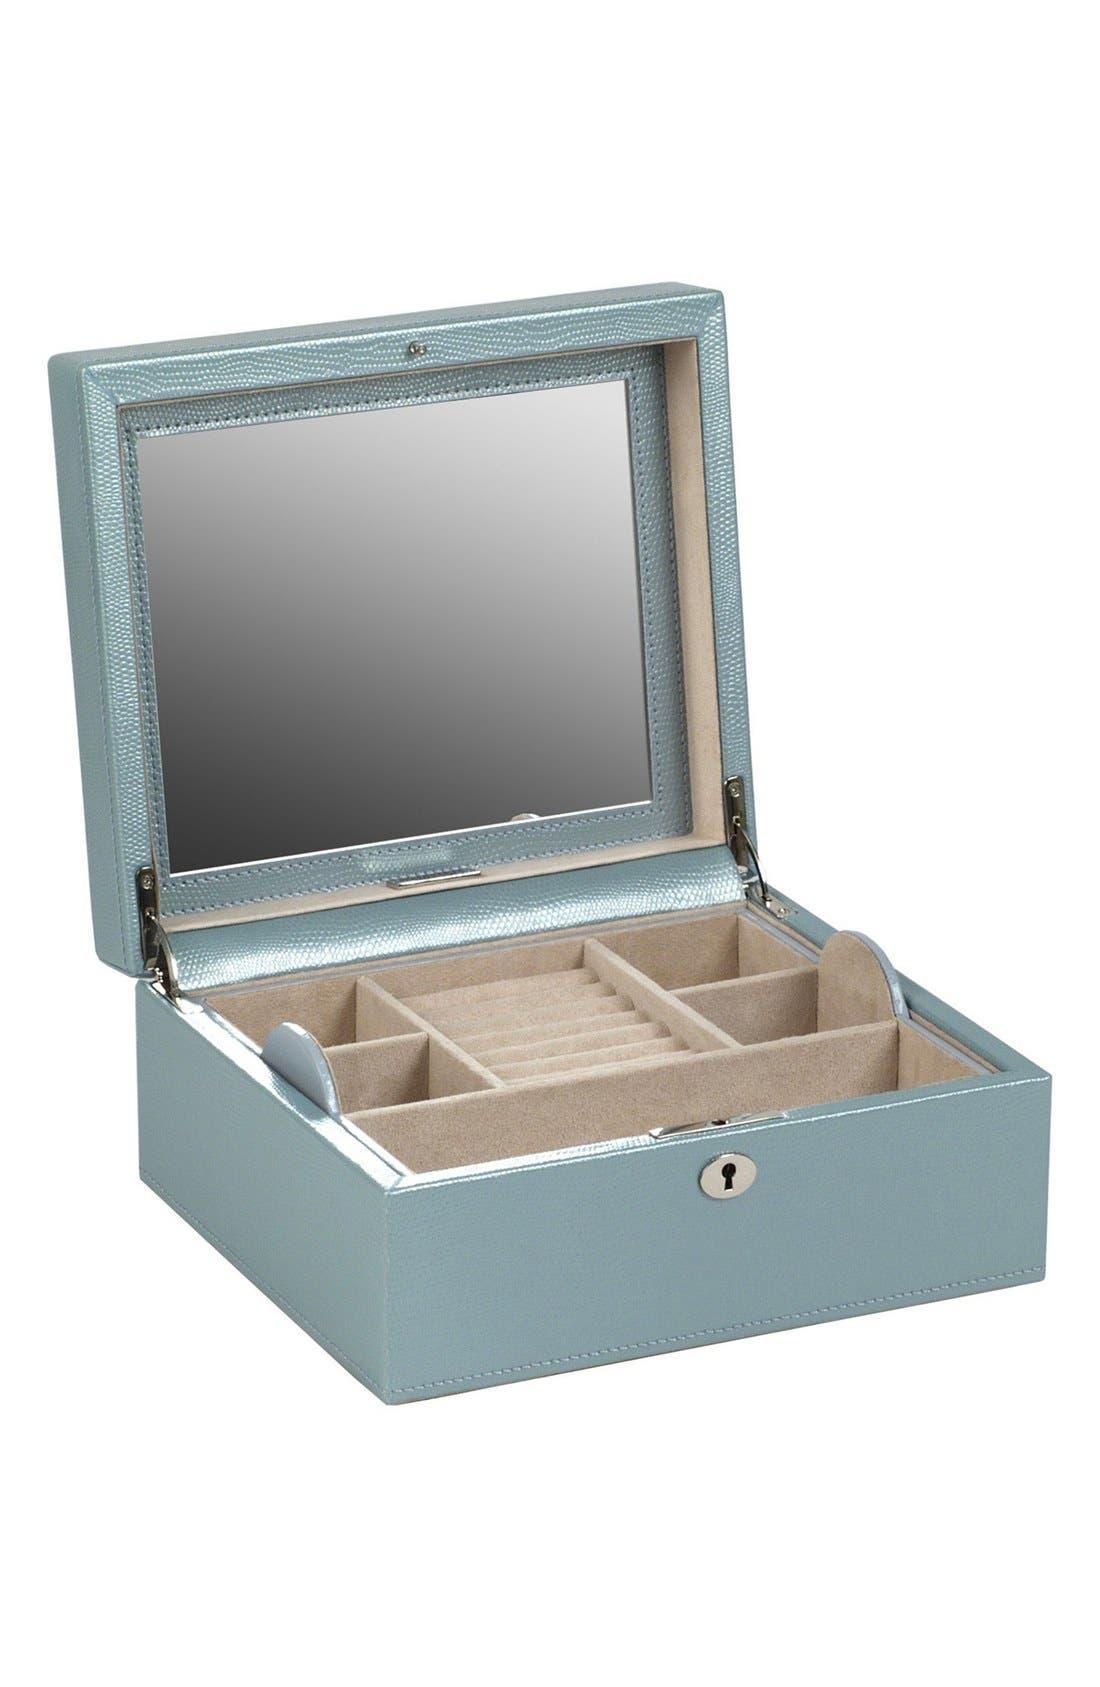 Alternate Image 3  - Wolf London Square Jewelry Box